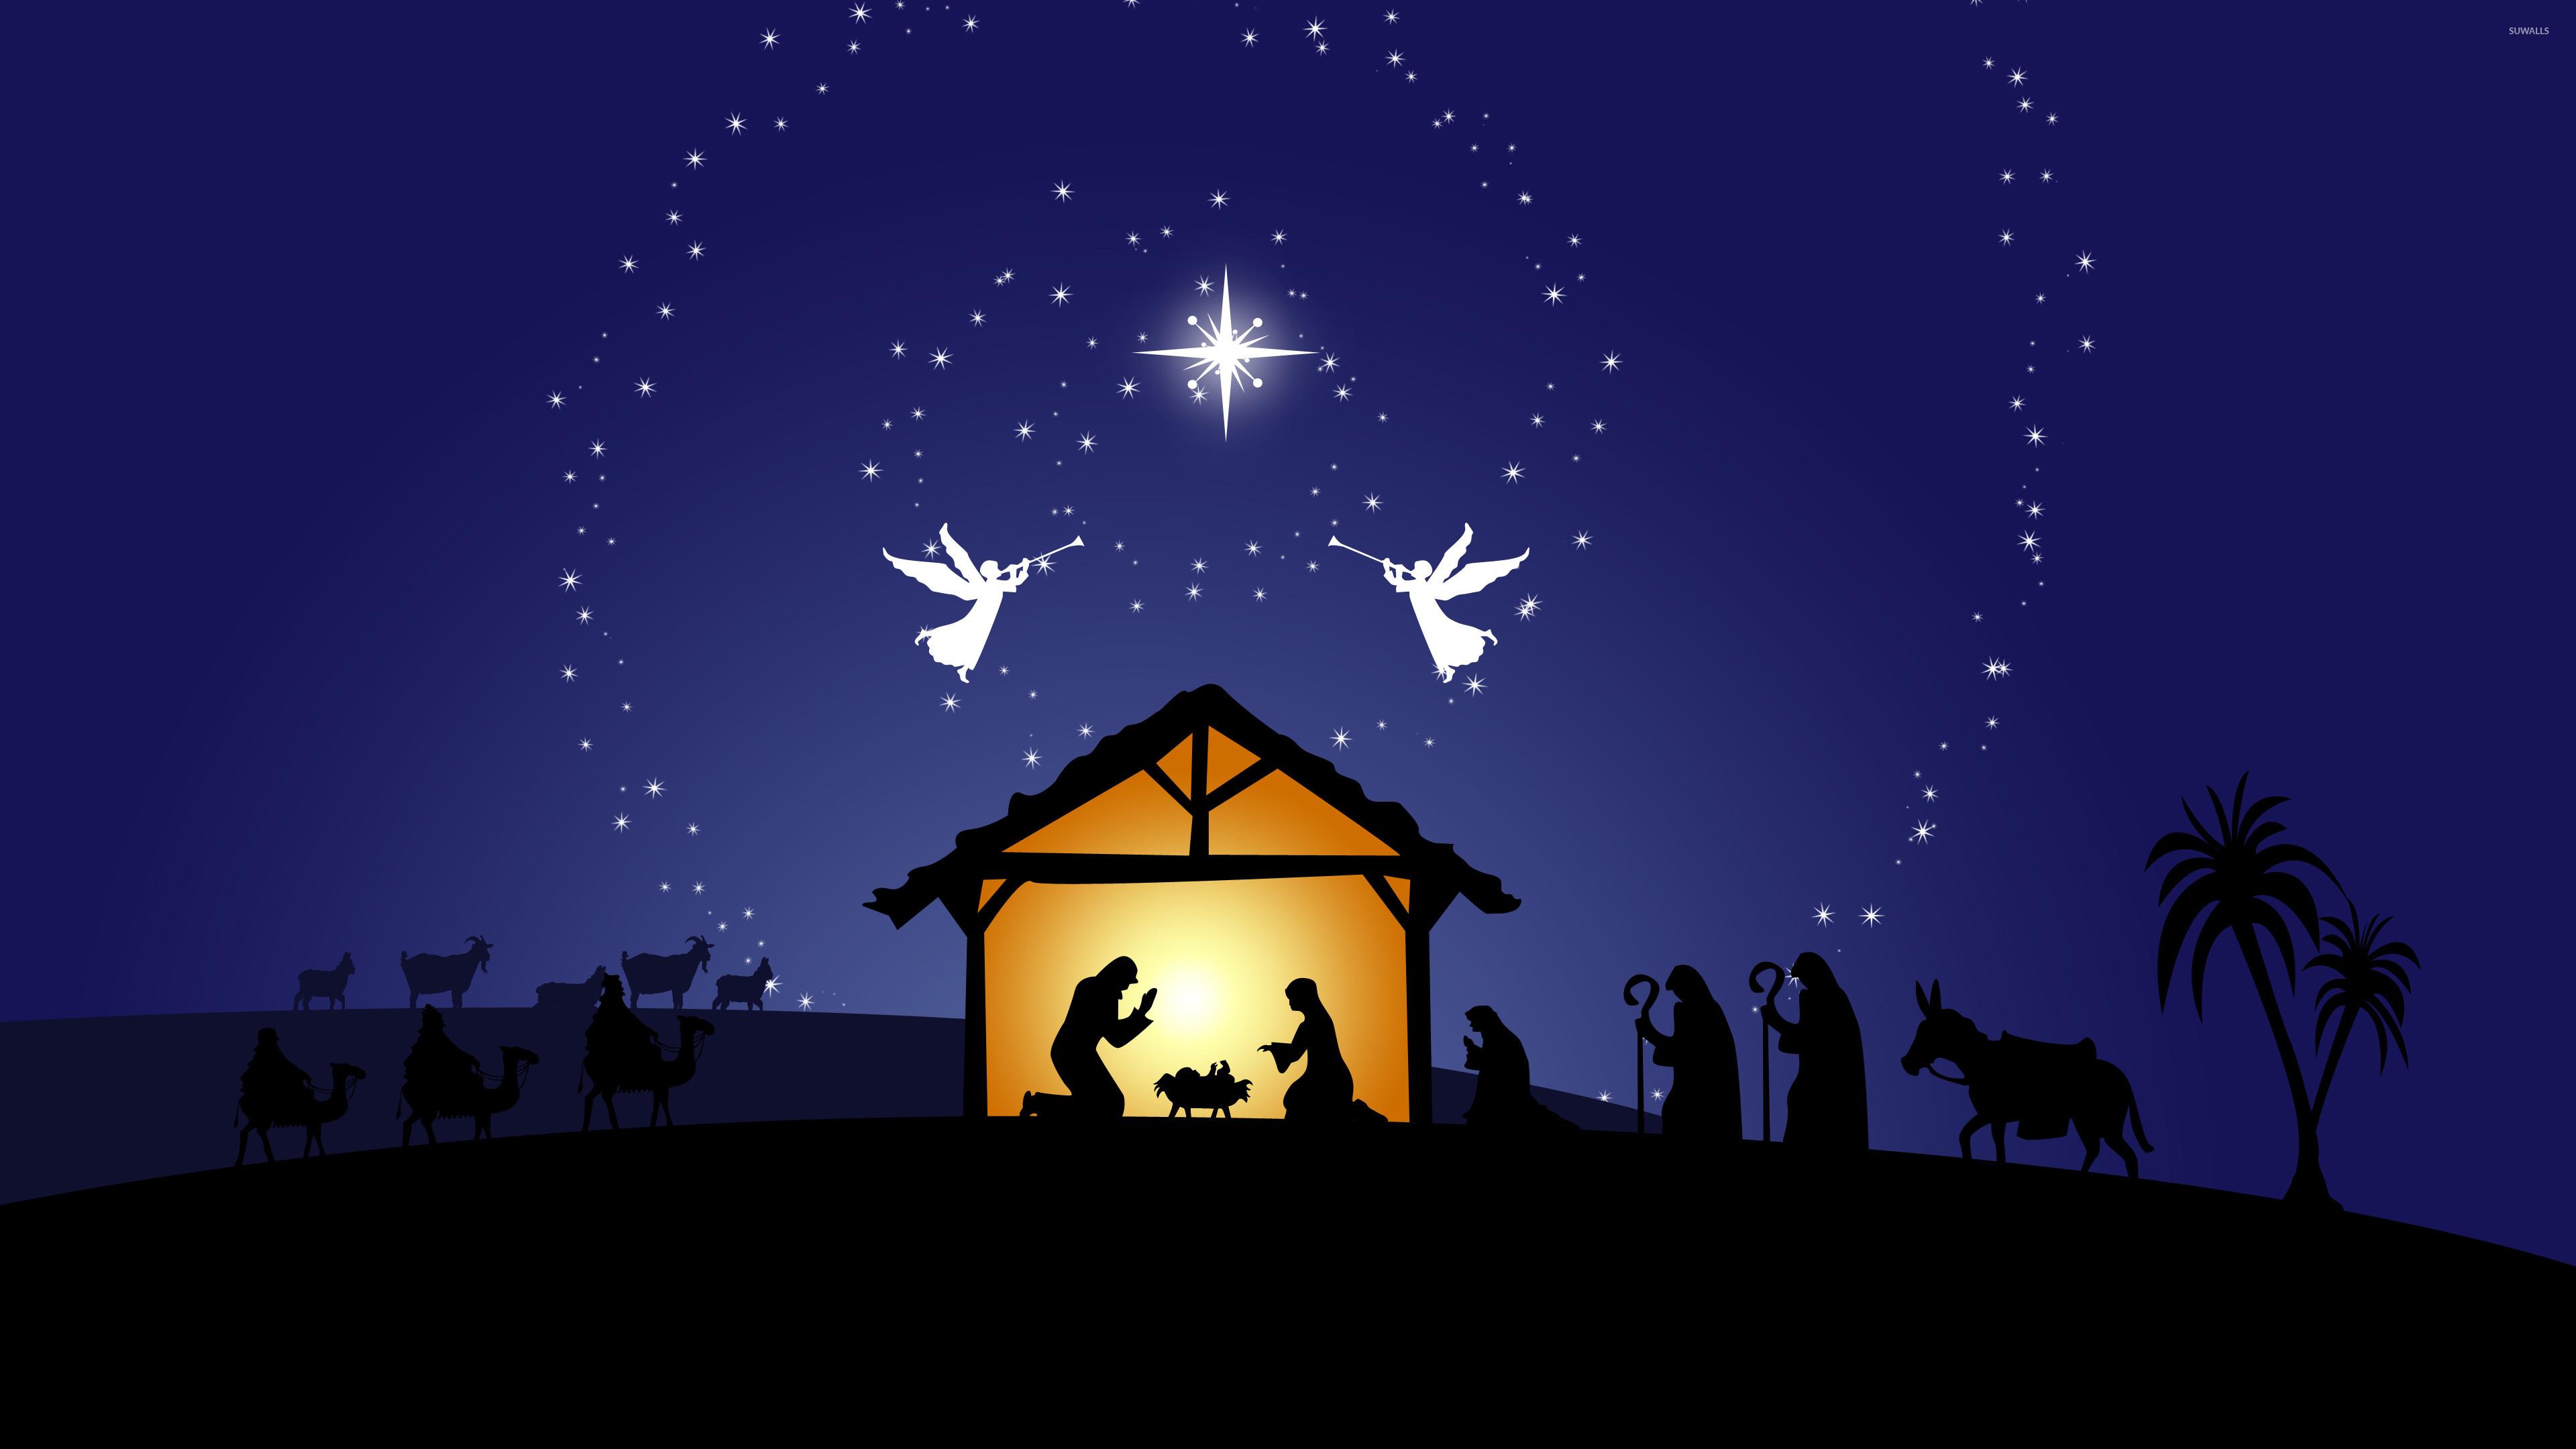 3840x2160 Nativity Scene Wallpaper Download